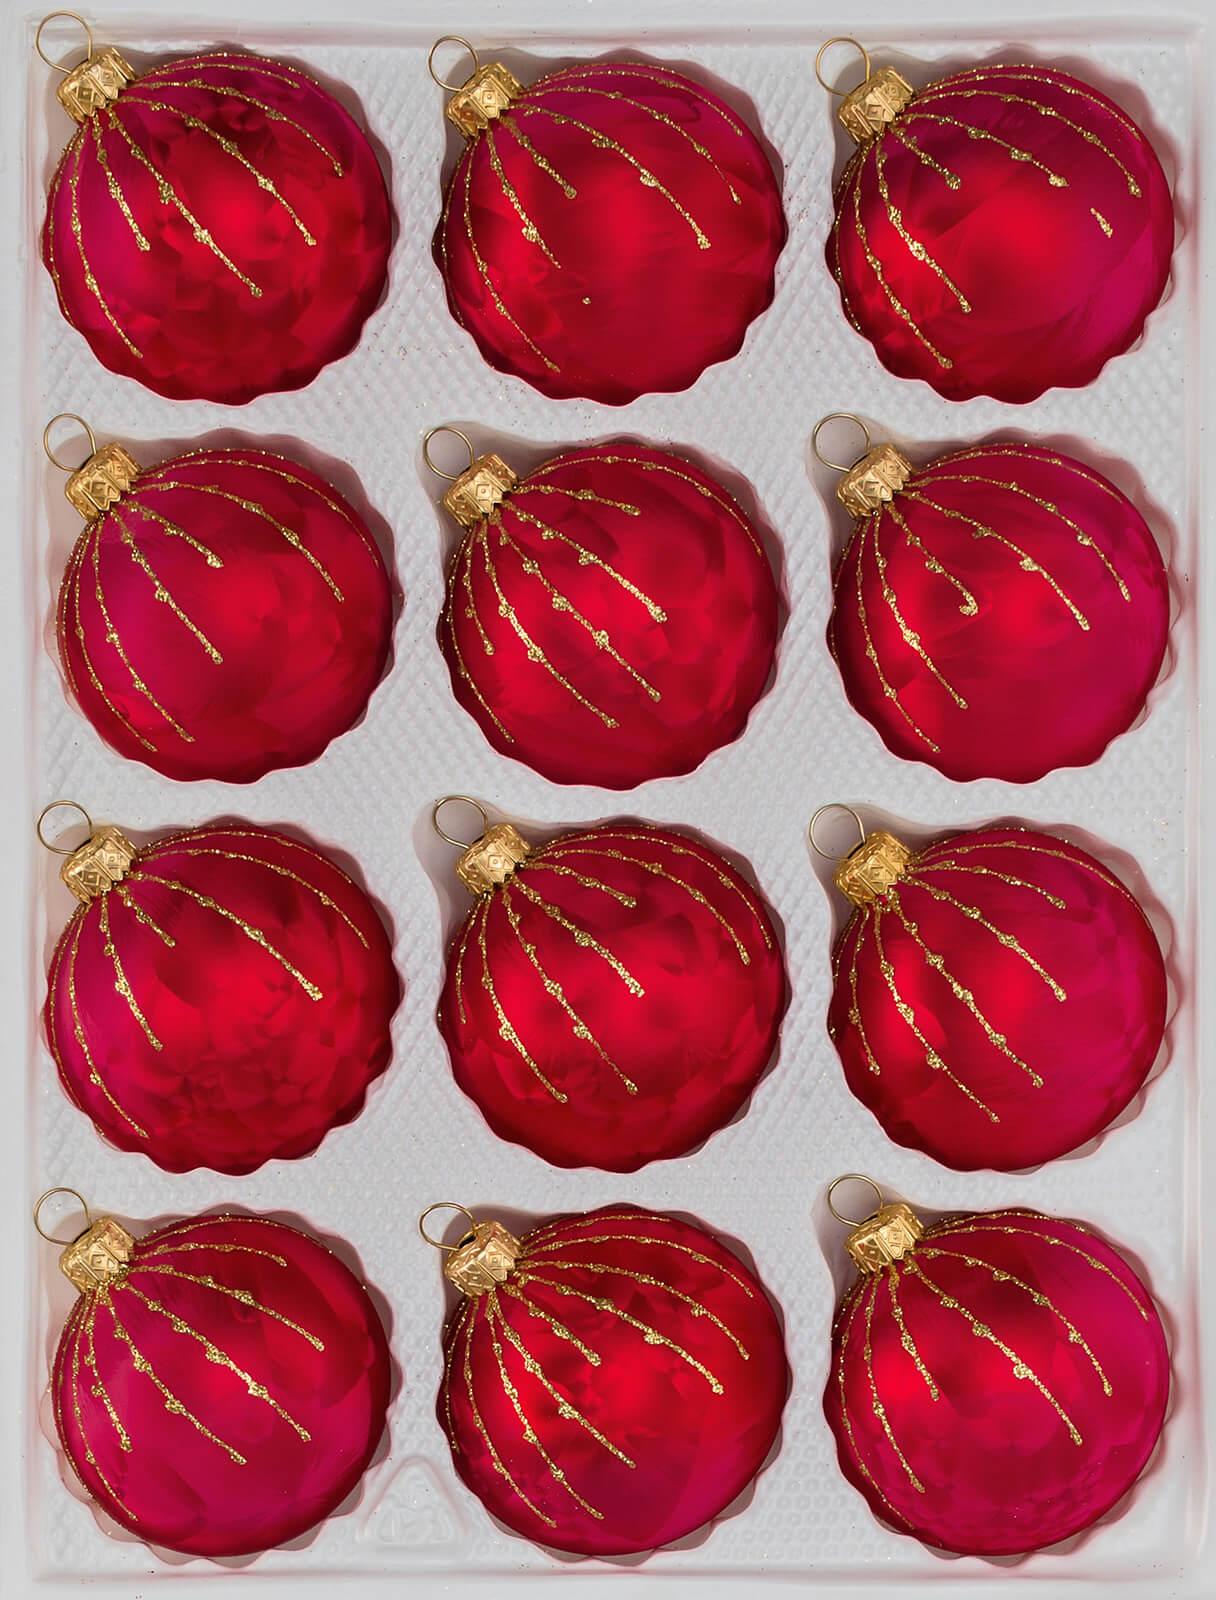 Christbaumkugeln Set Rot.12 Tlg Glas Weihnachtskugeln Set In Ice Rot Gold Regen